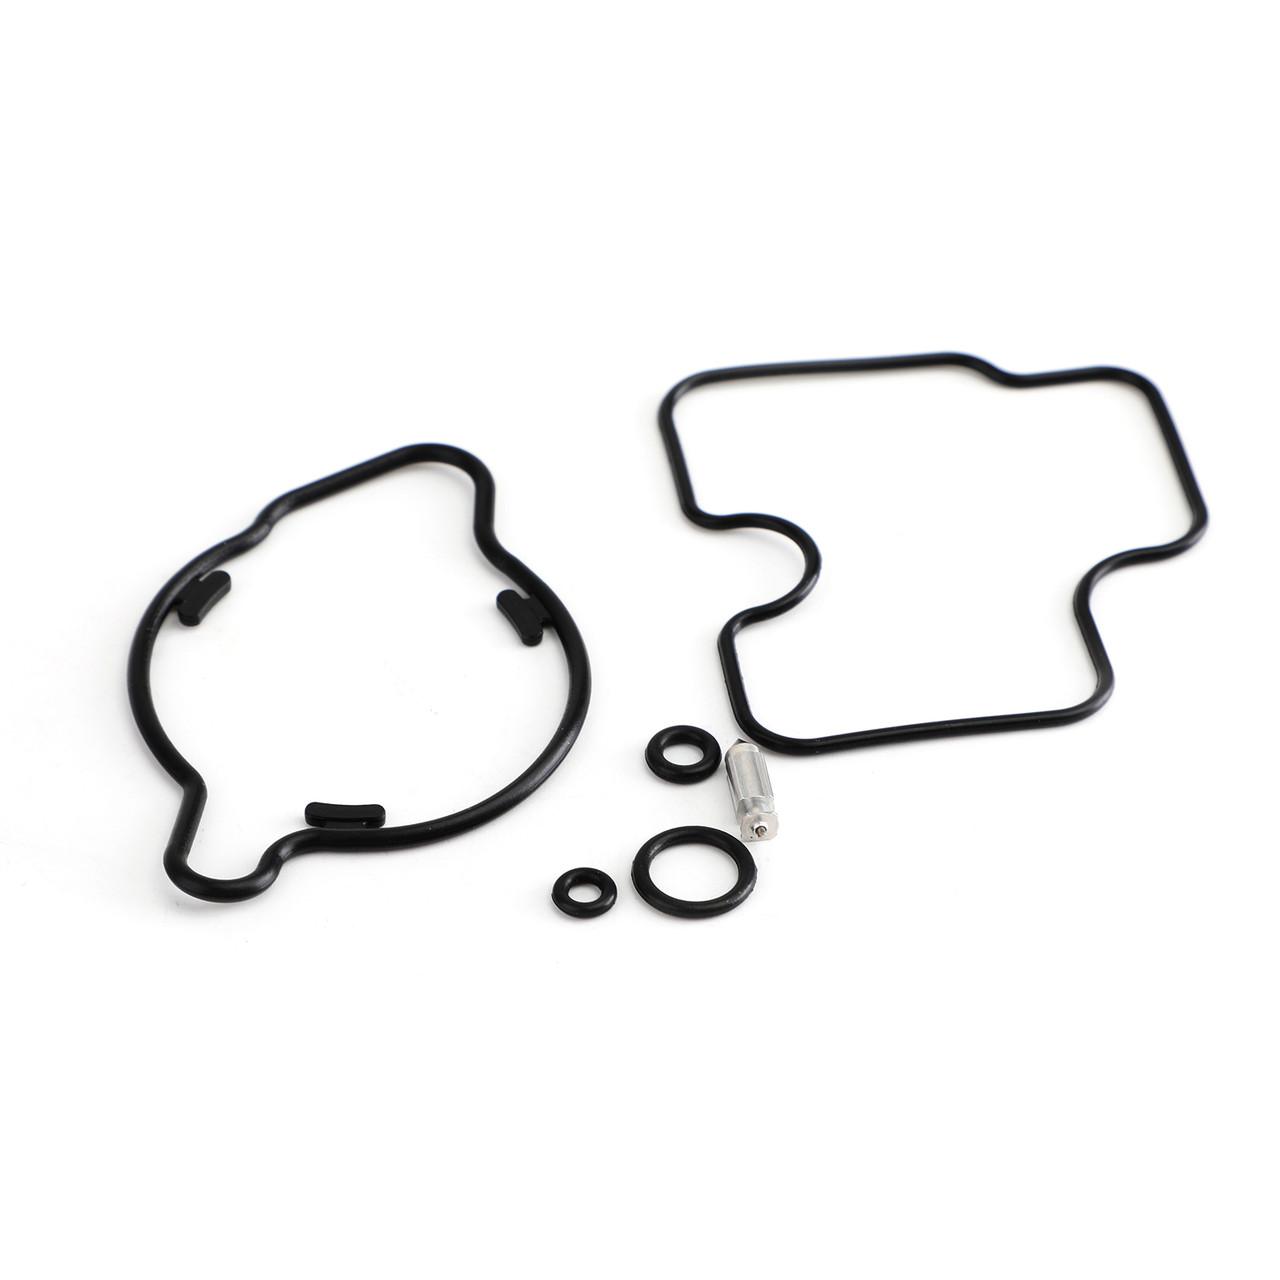 Carburetor repair kits For Honda CBR600F2 94-03 VF750C Magna 94-95 CB1000 18-5394